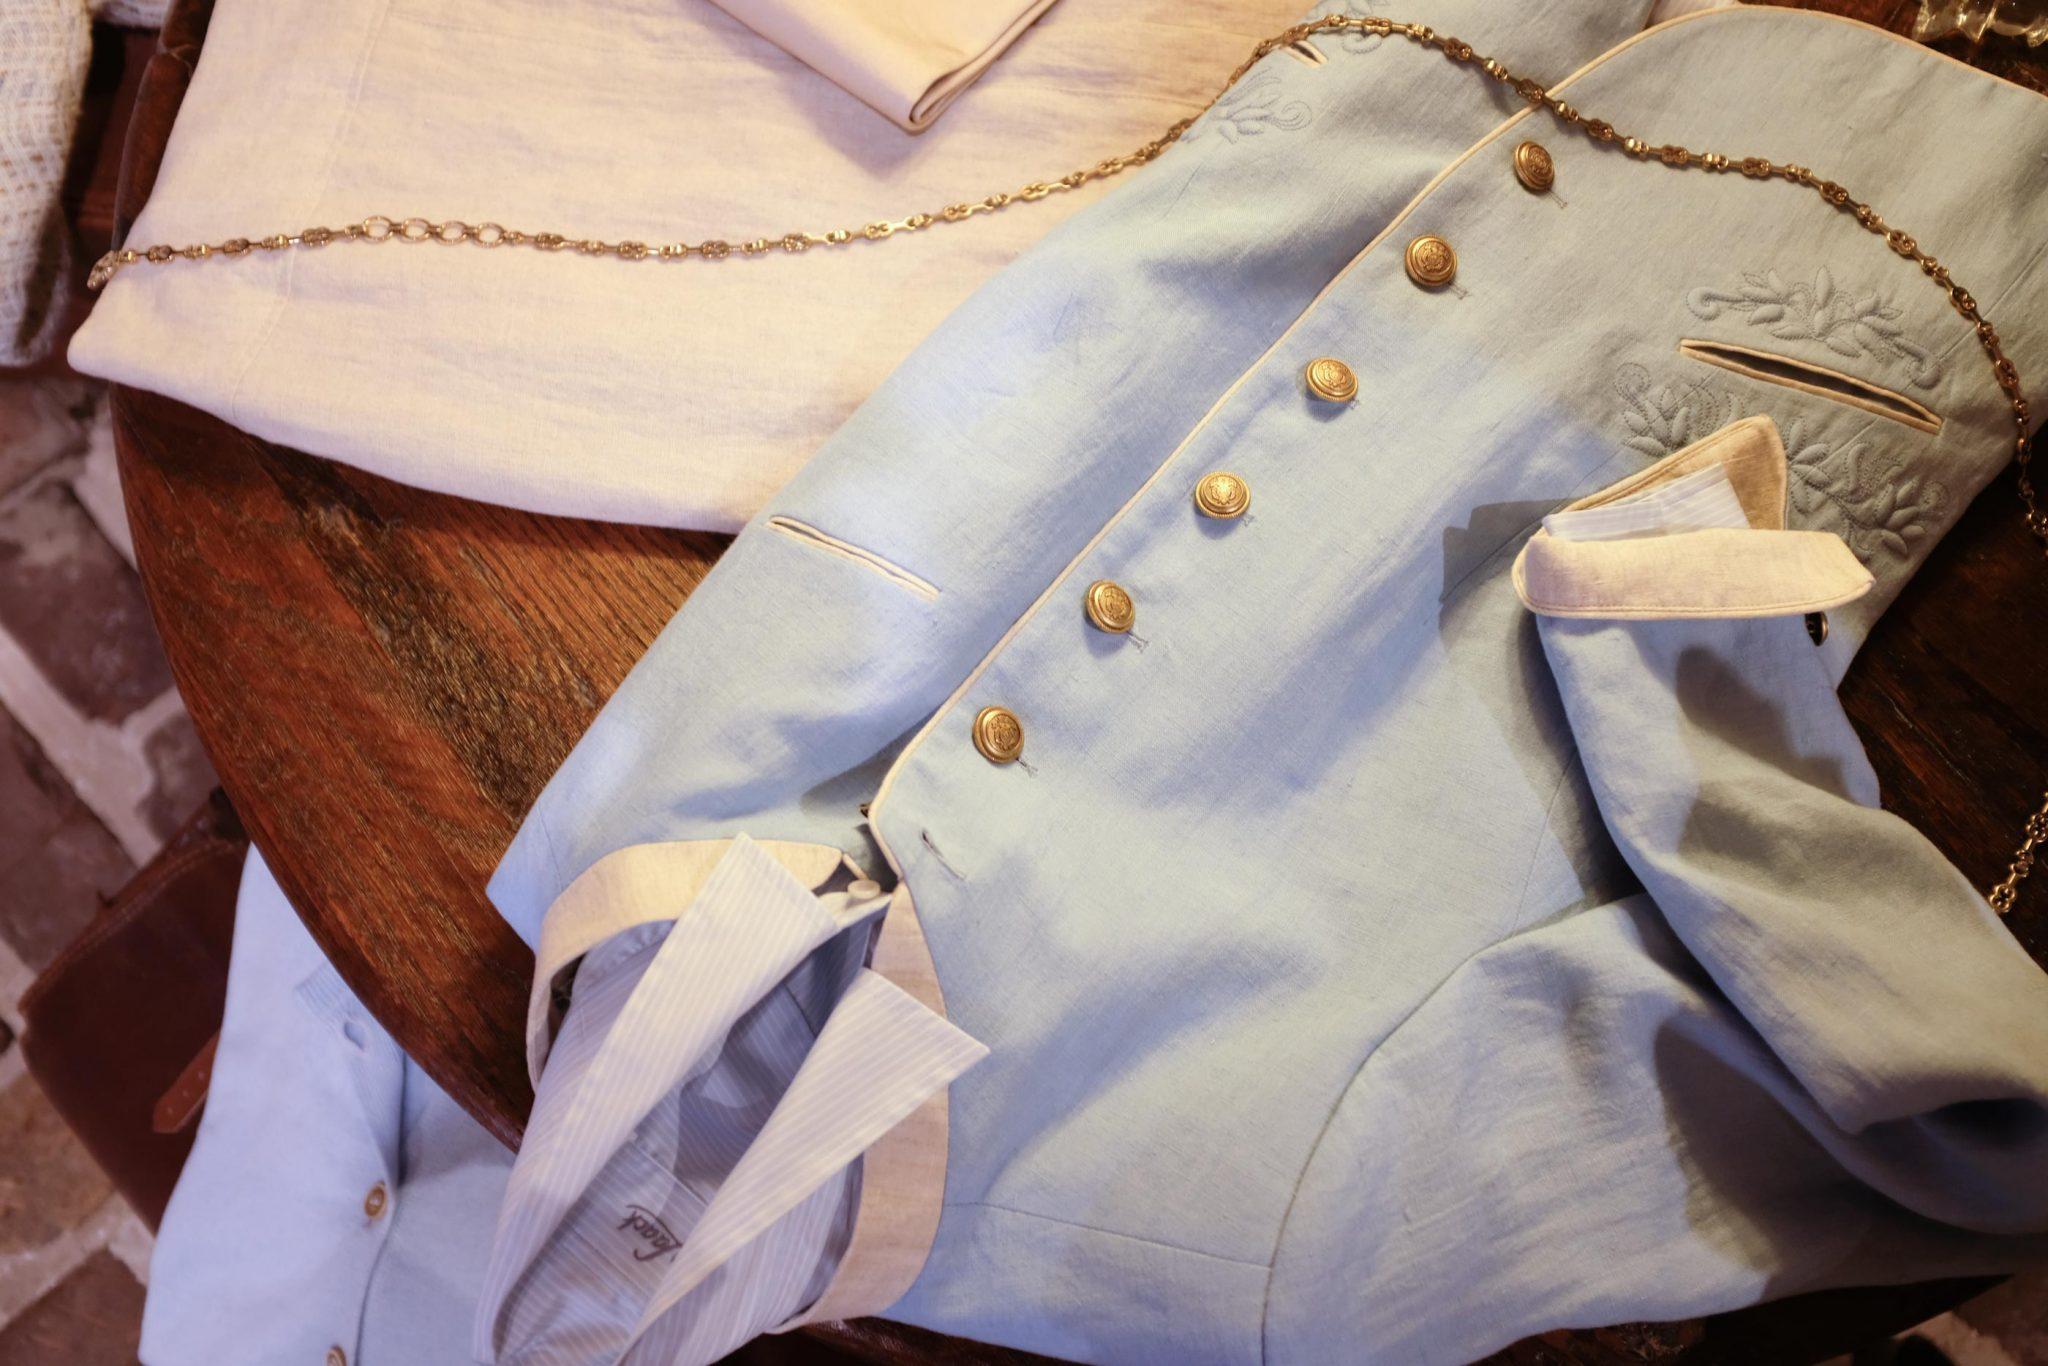 Spring lichtblauw jasje